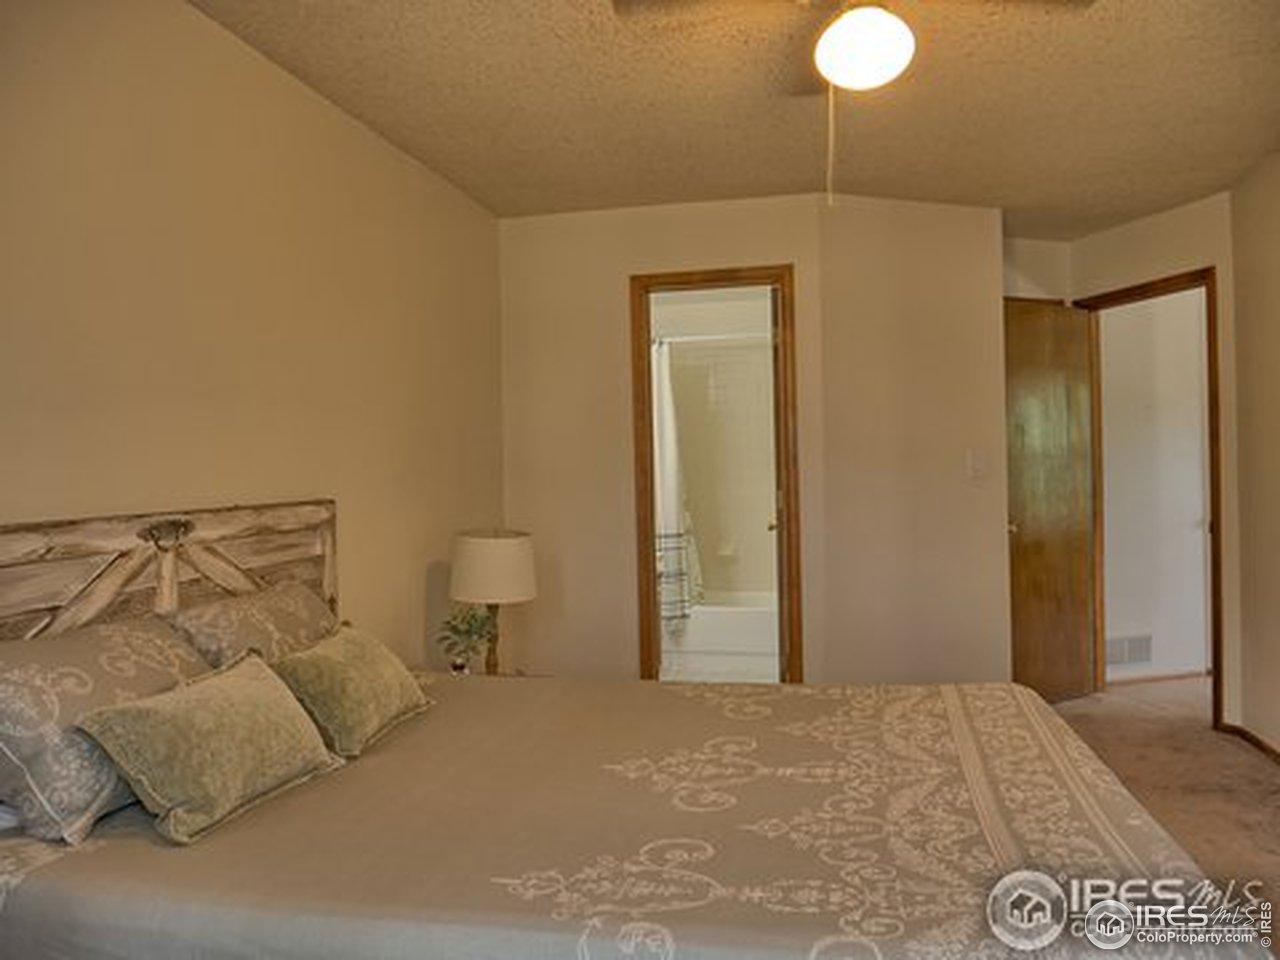 Bedroom facing the bathroom